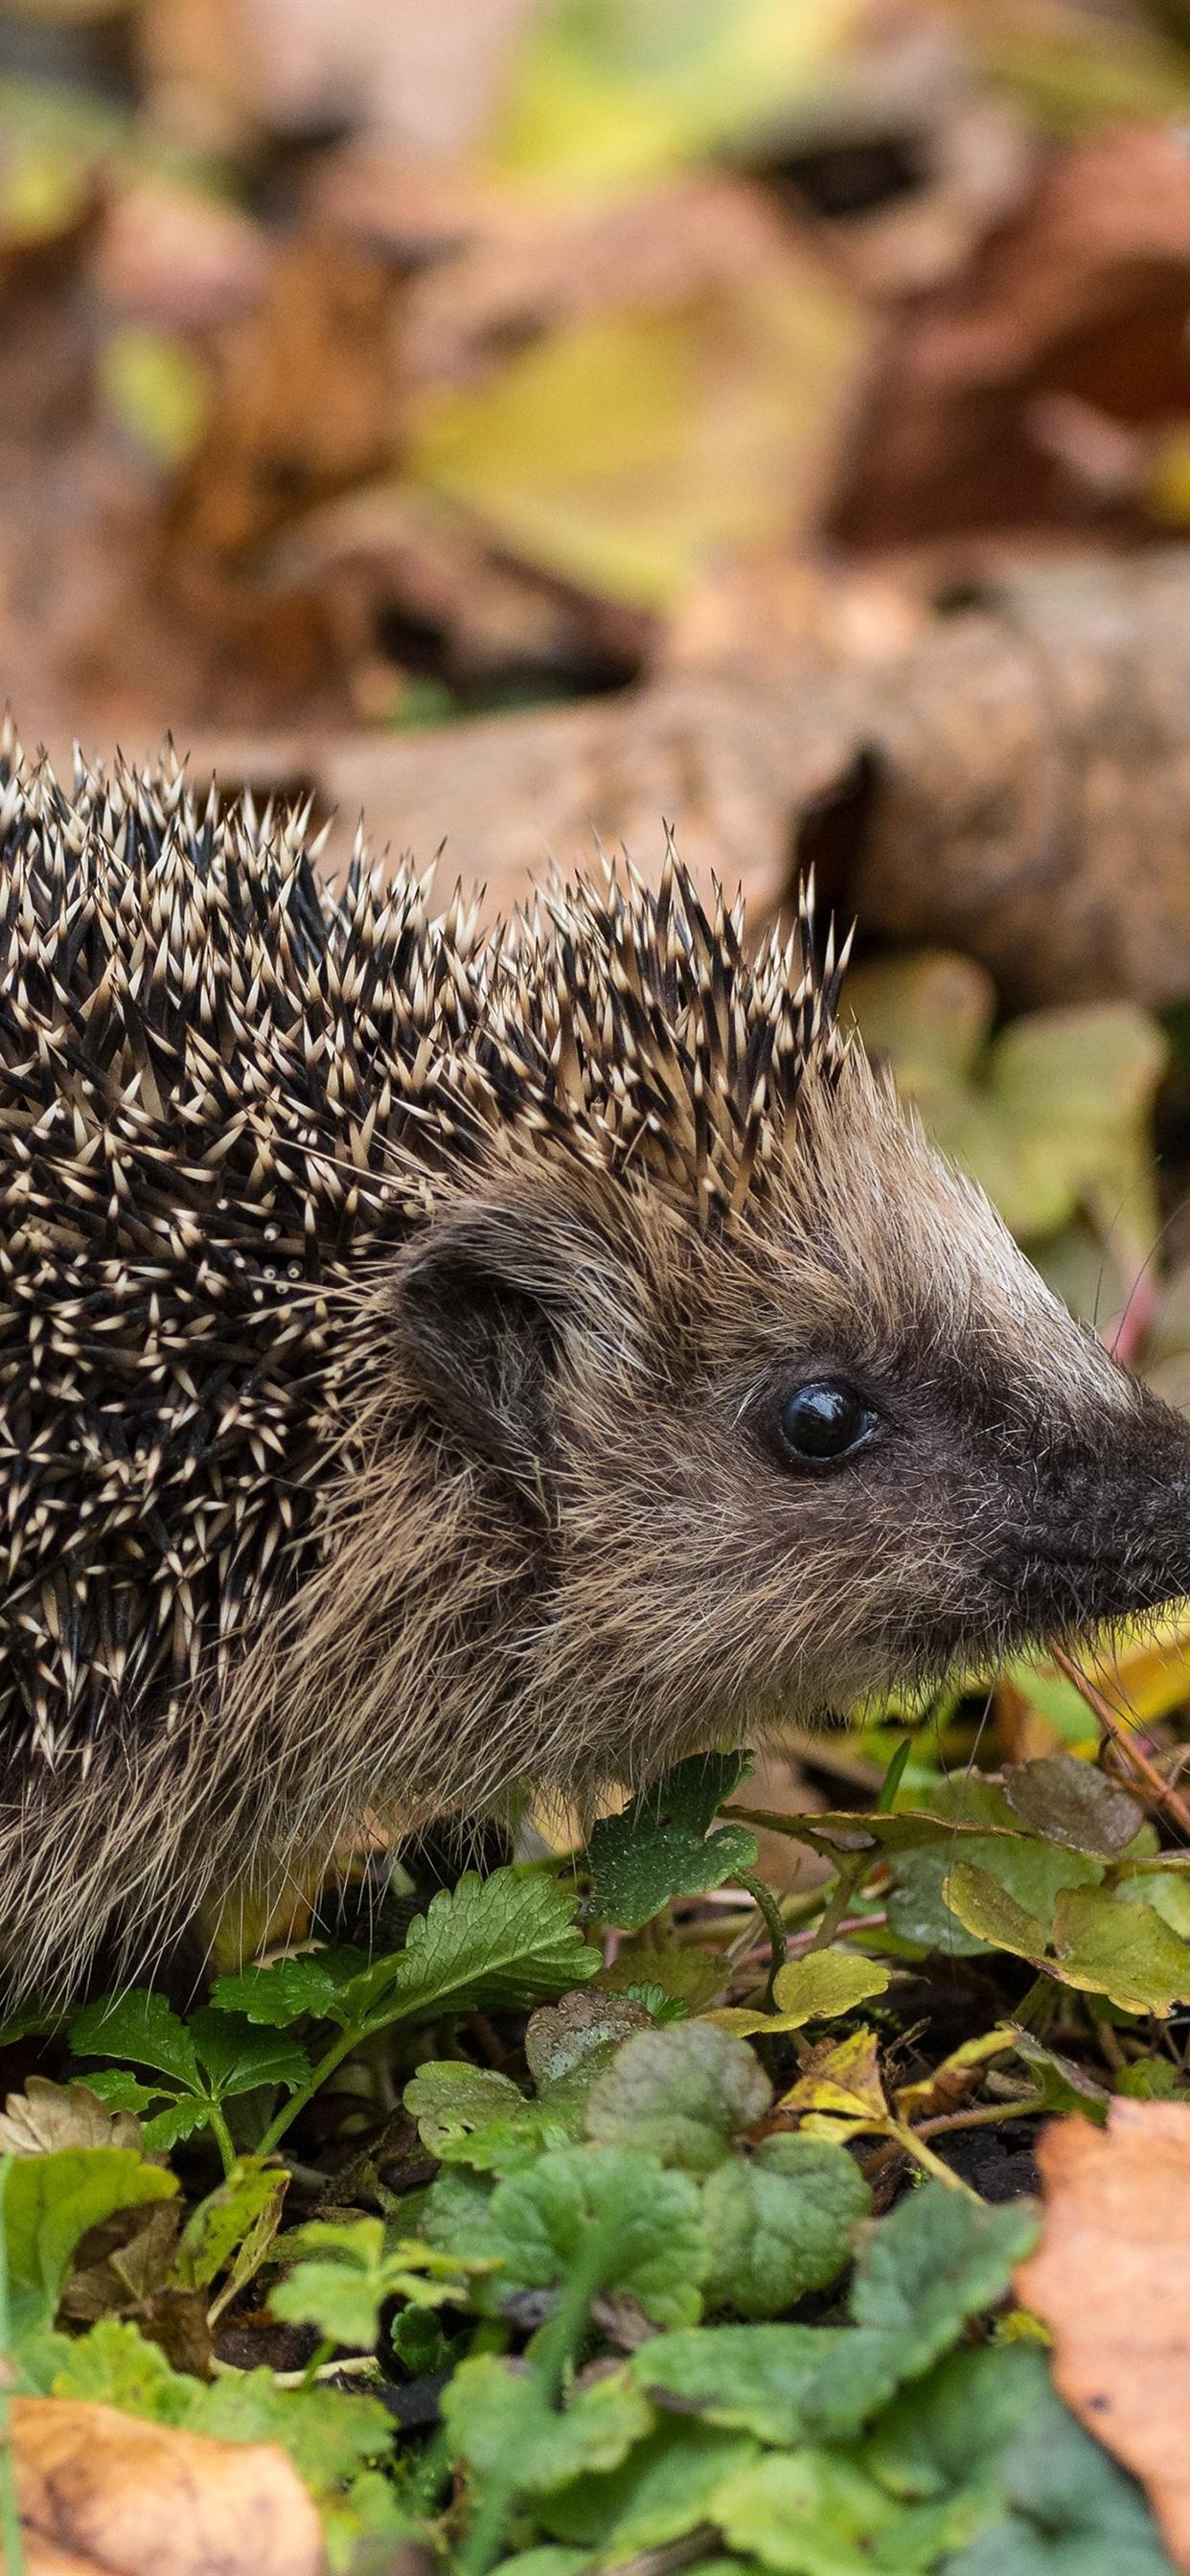 hedgehog many needles ground leaves 1242x2688 iphone xs